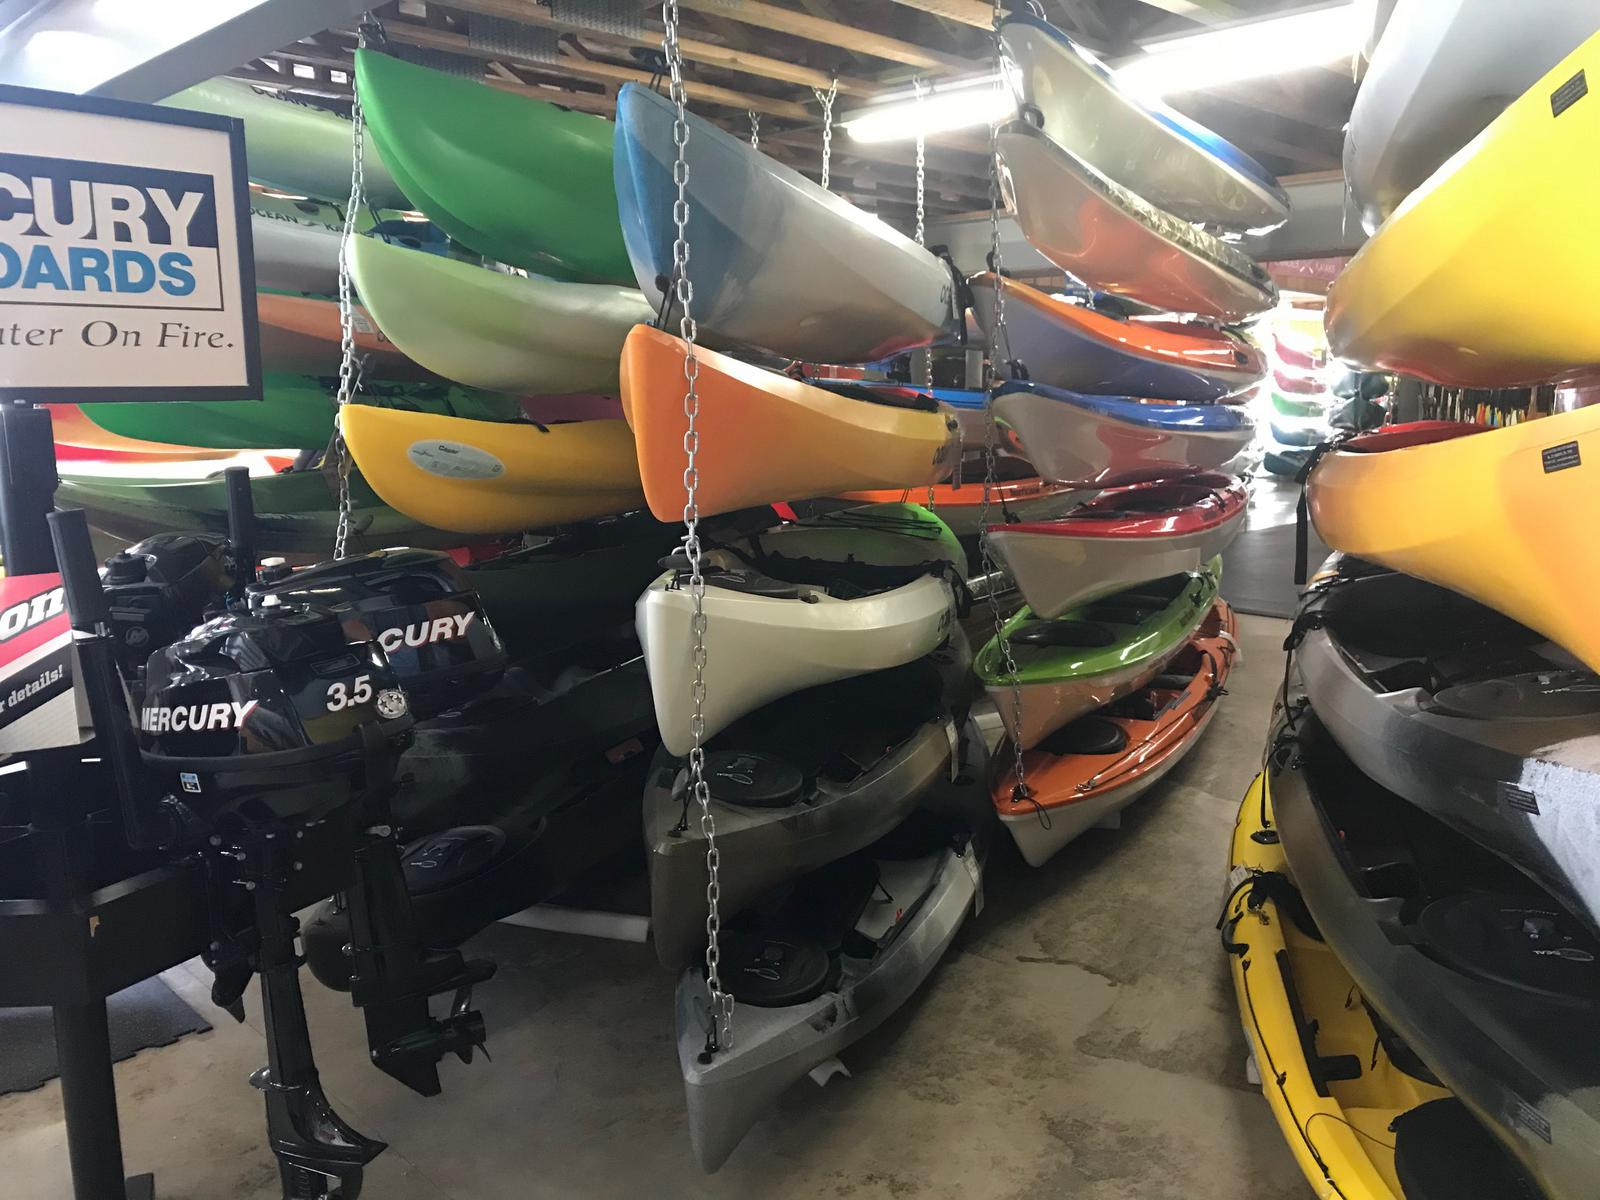 Ocean Kayak Tetra 10 Angler For Sale In Ephrata Pa